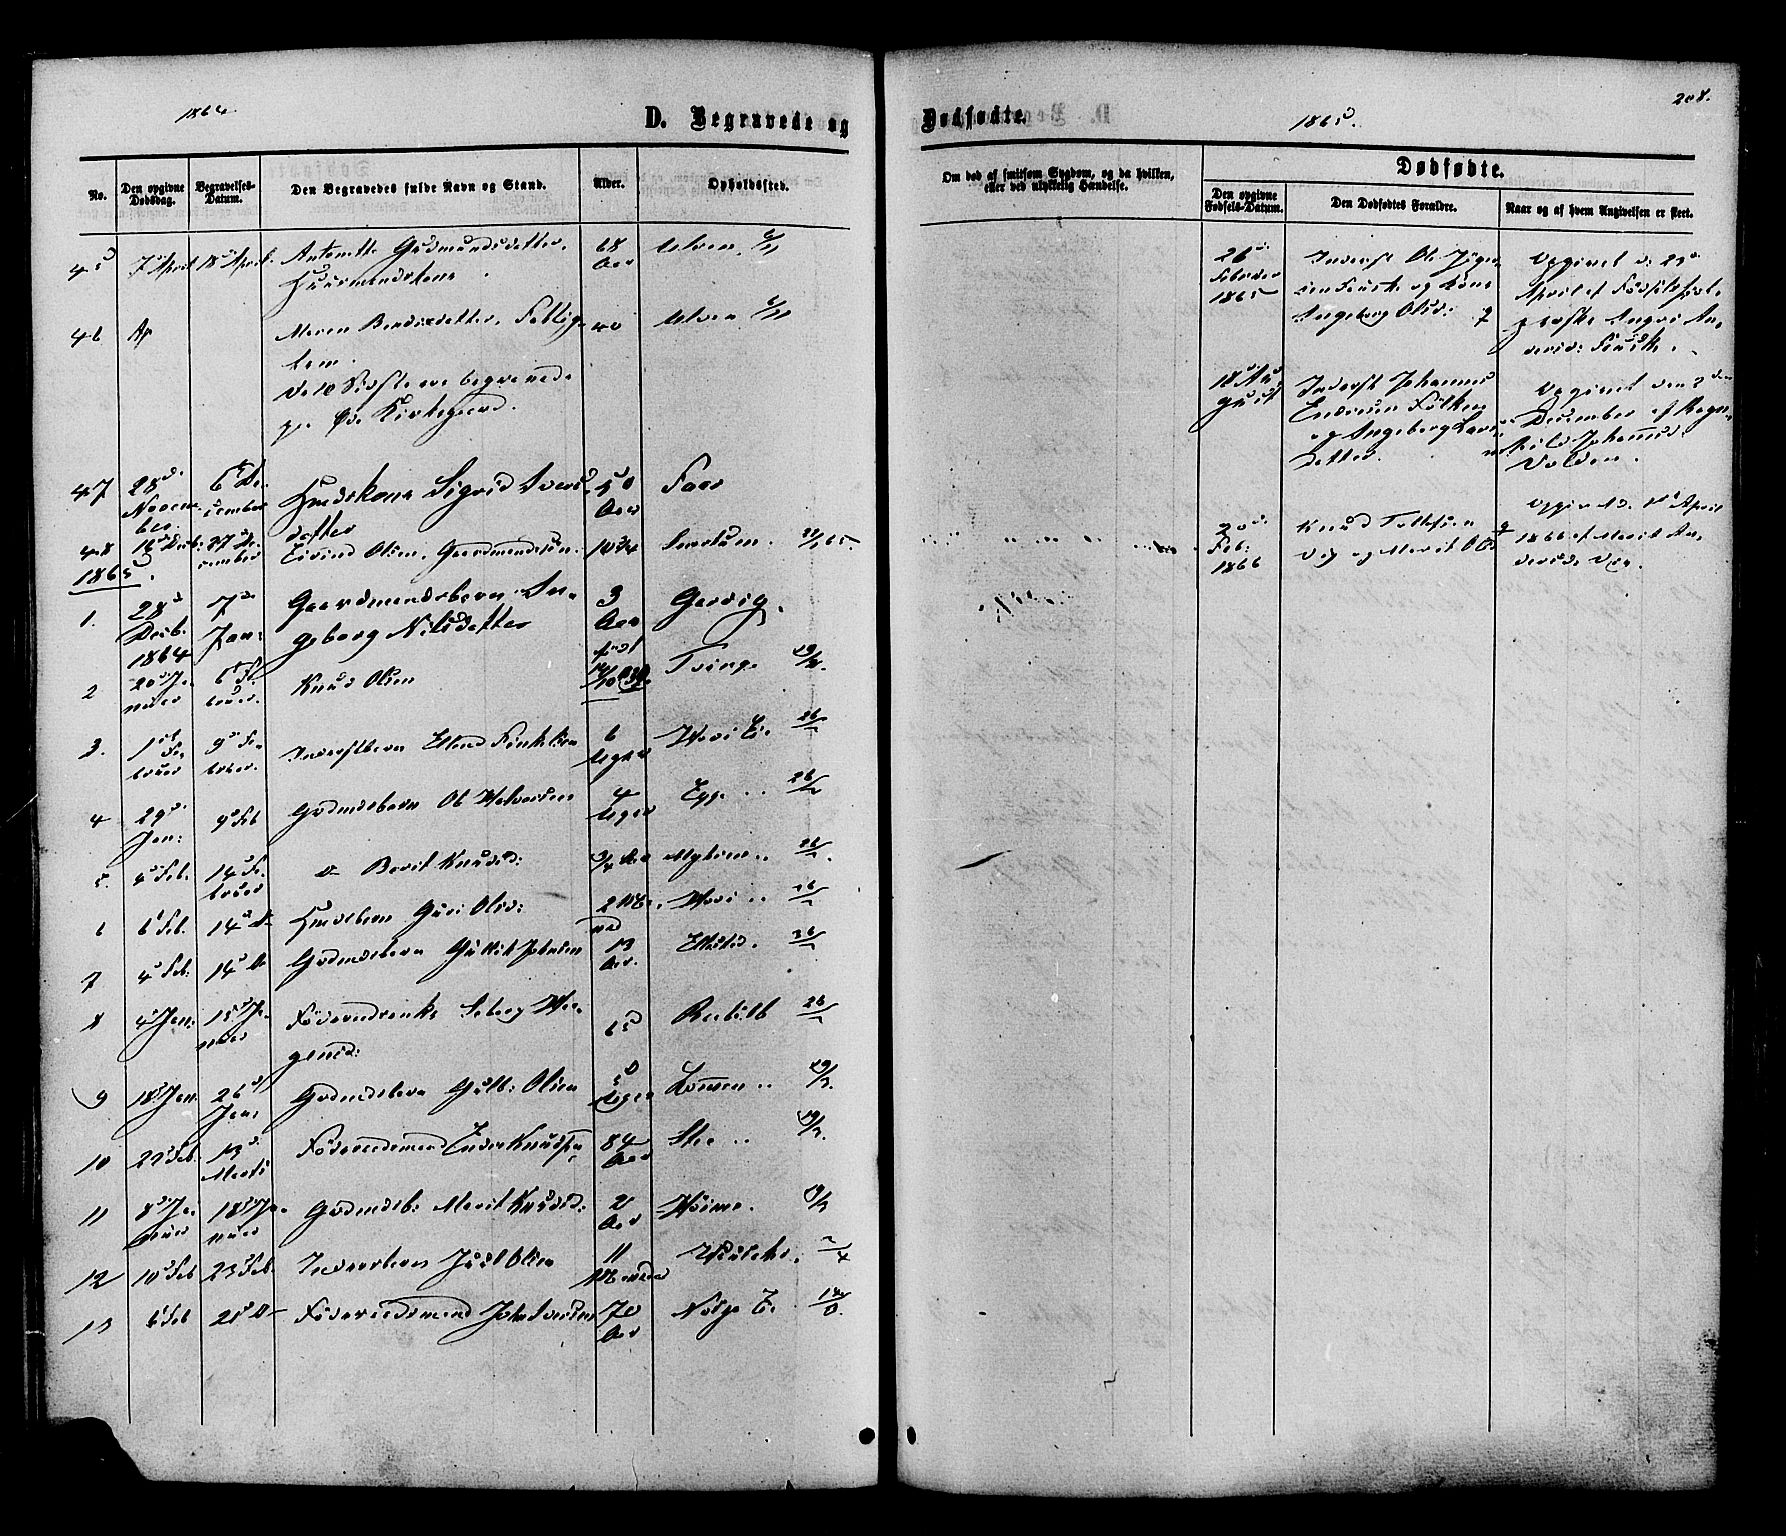 SAH, Vestre Slidre prestekontor, Ministerialbok nr. 3, 1865-1880, s. 208